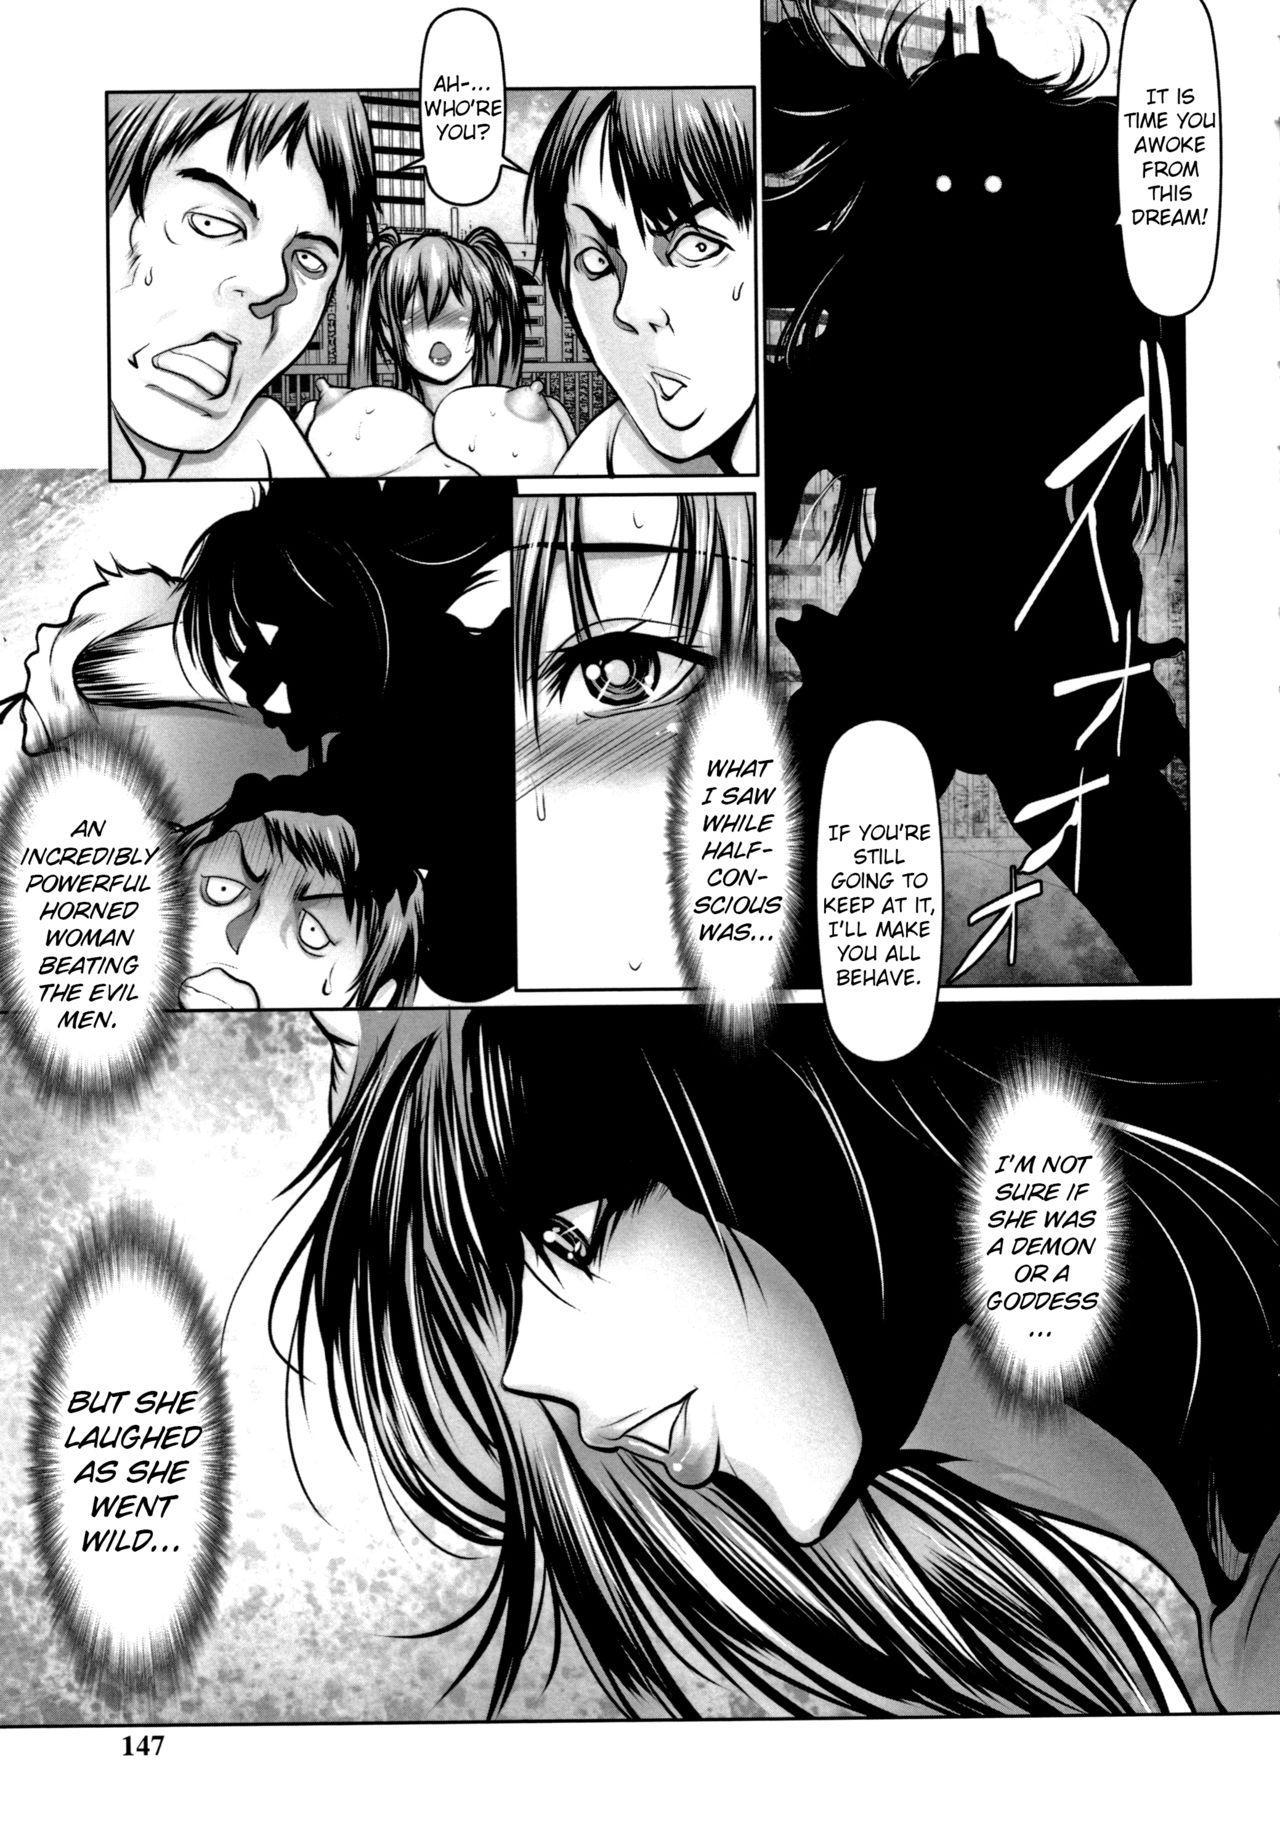 [San Kento] Koufuku no Plu-san Ch. 3 Heroine Shokushu Monzetsu Pinch | The blessed Plu-san Ch. 3 The Heroine's Tentacle Fainting Predicament (Mugen ni Kanjiru Onna no Karada) [English] [ChoriScans] 22